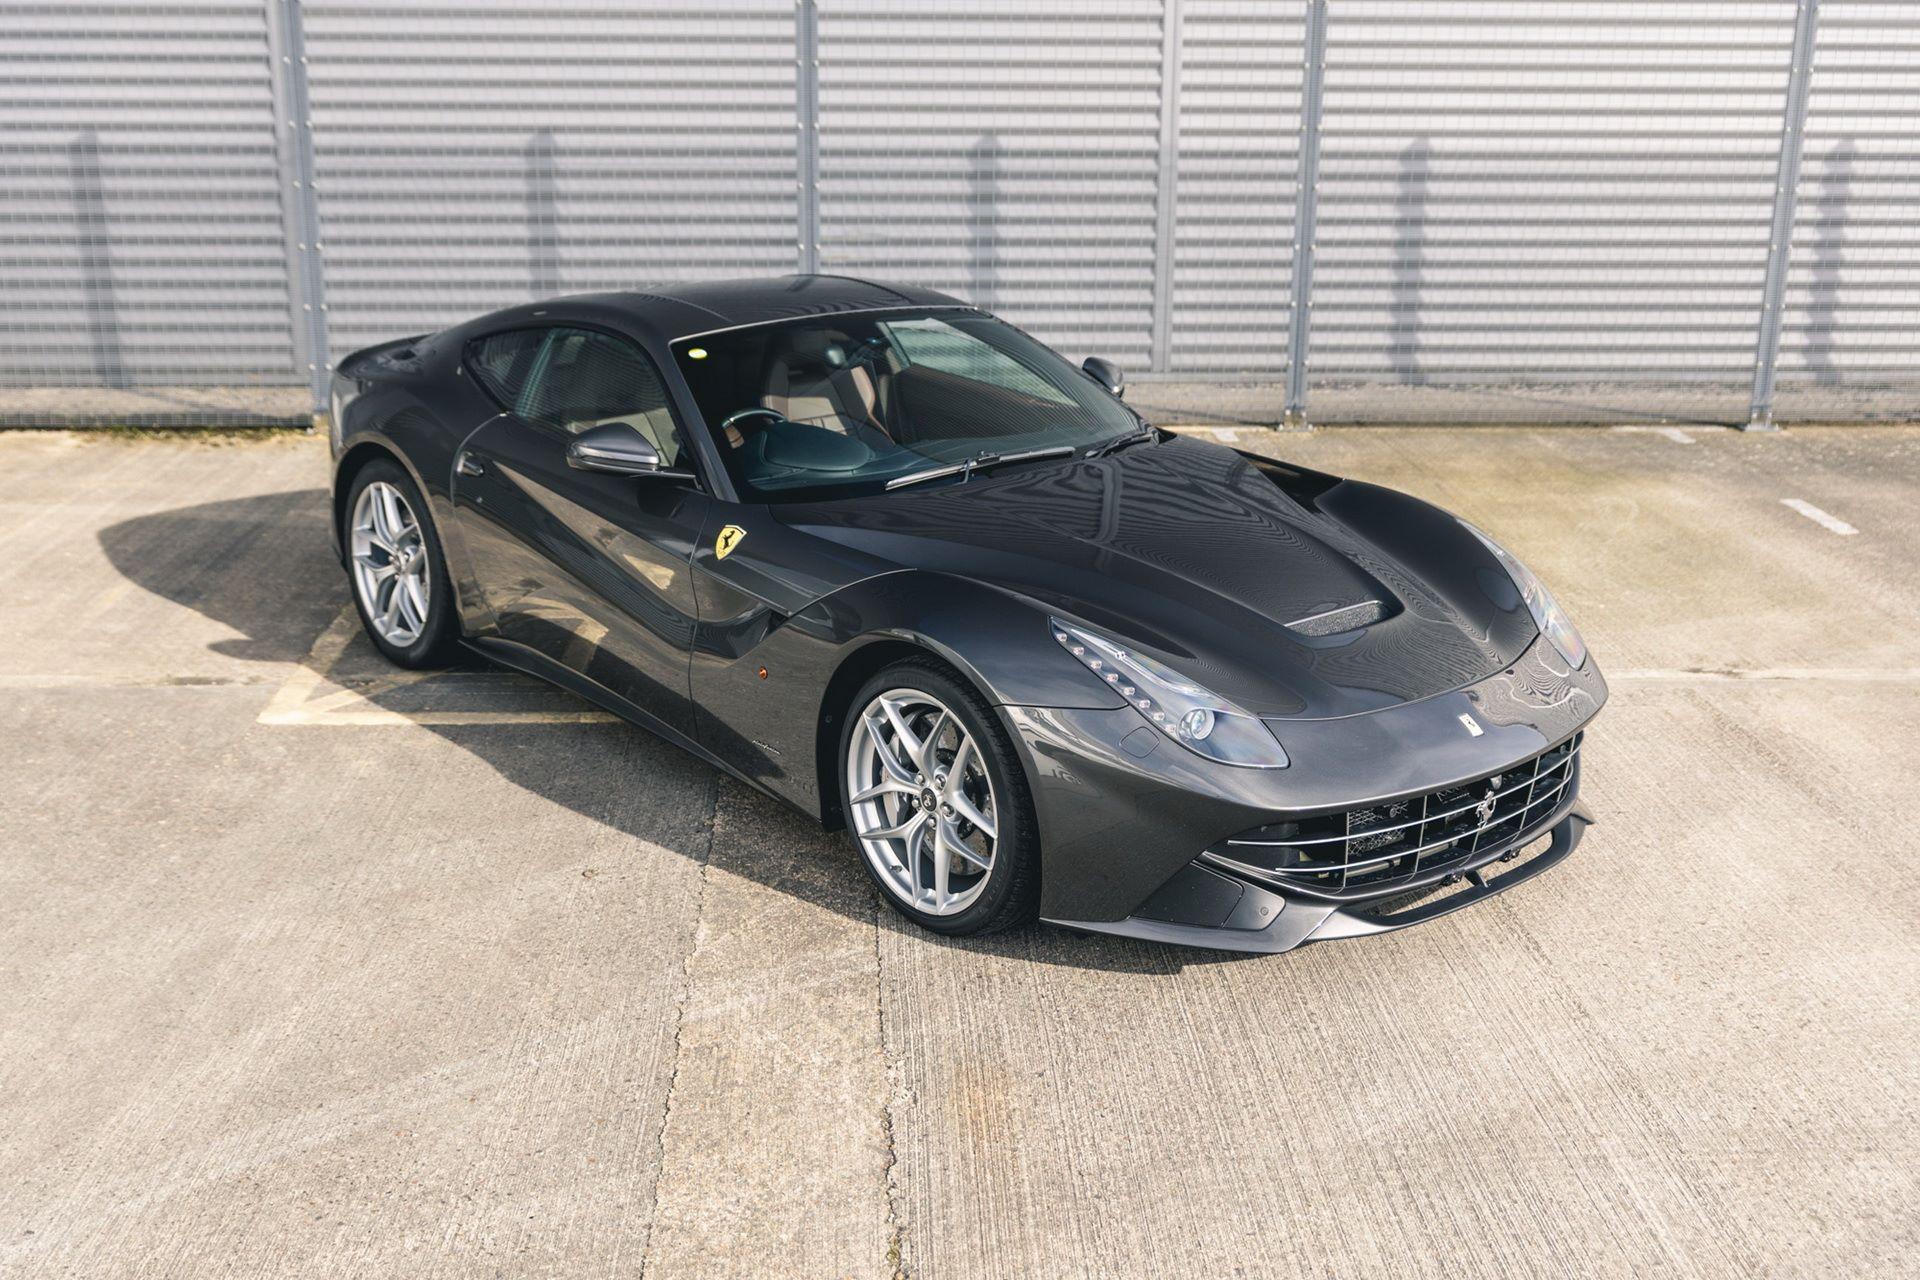 Ferrari-F12berlinetta-Chris-Harris-30